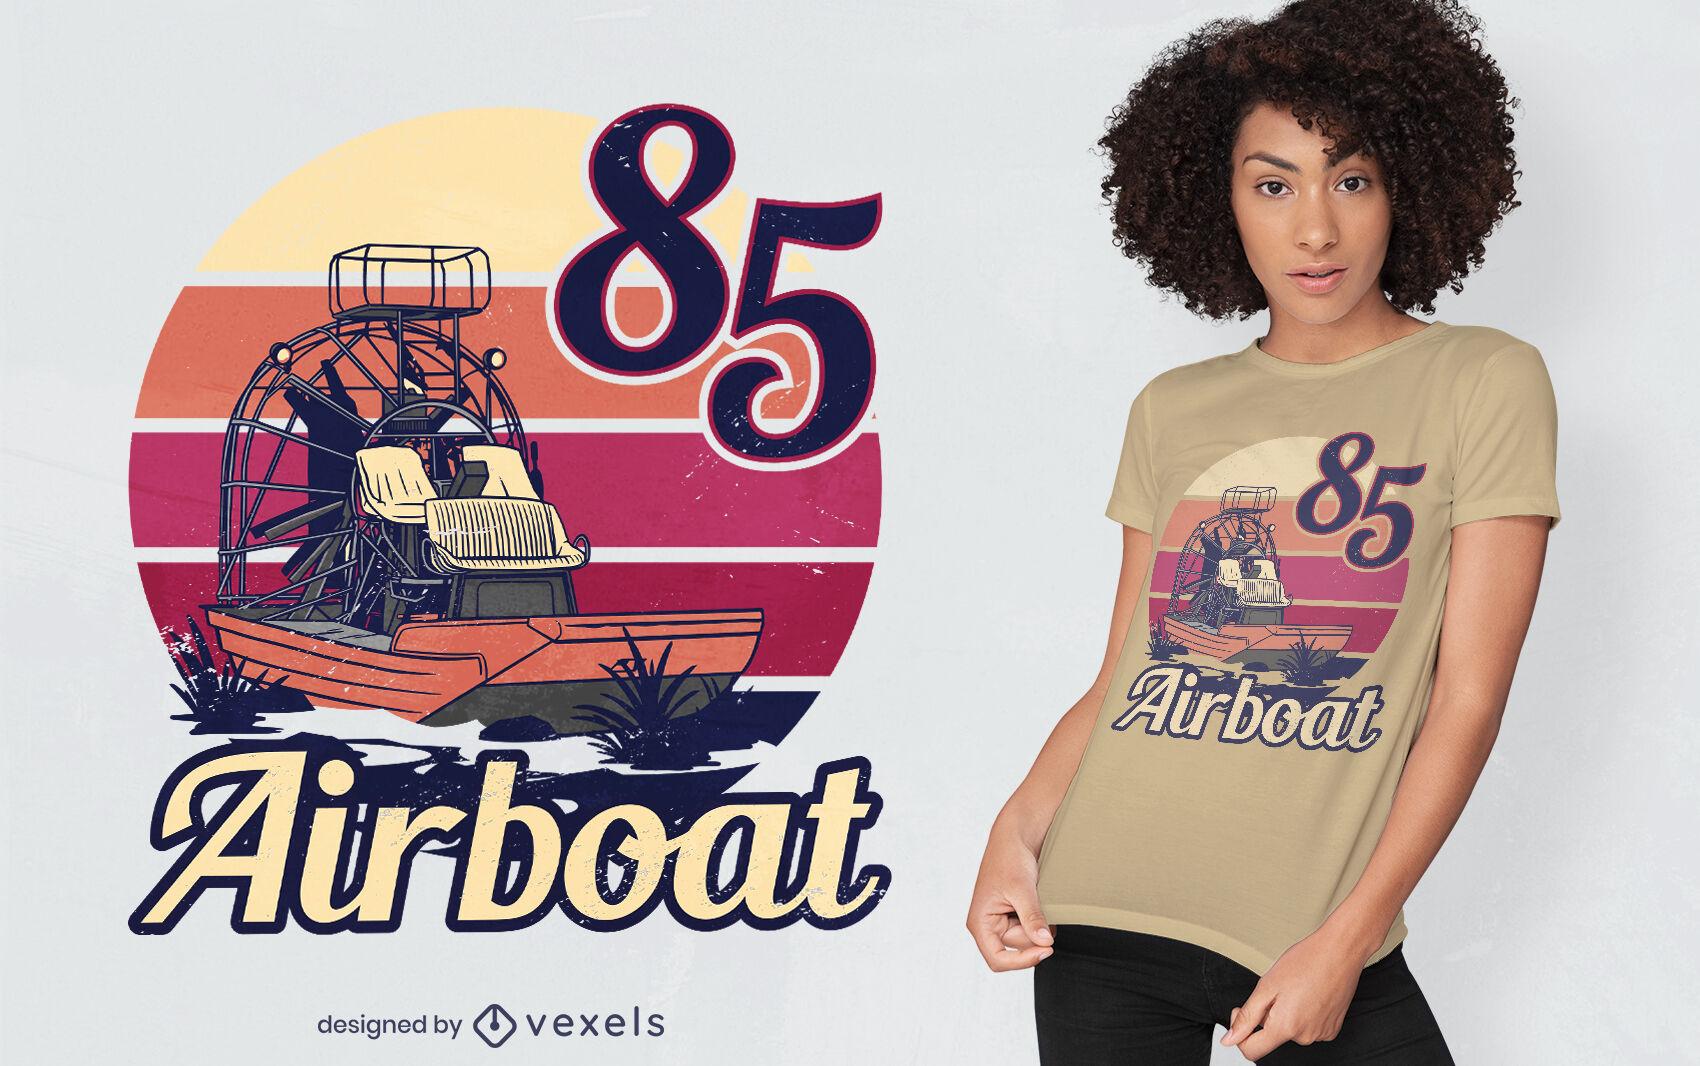 Airboat-Transport Retro-Sonnenuntergang-T-Shirt-Design